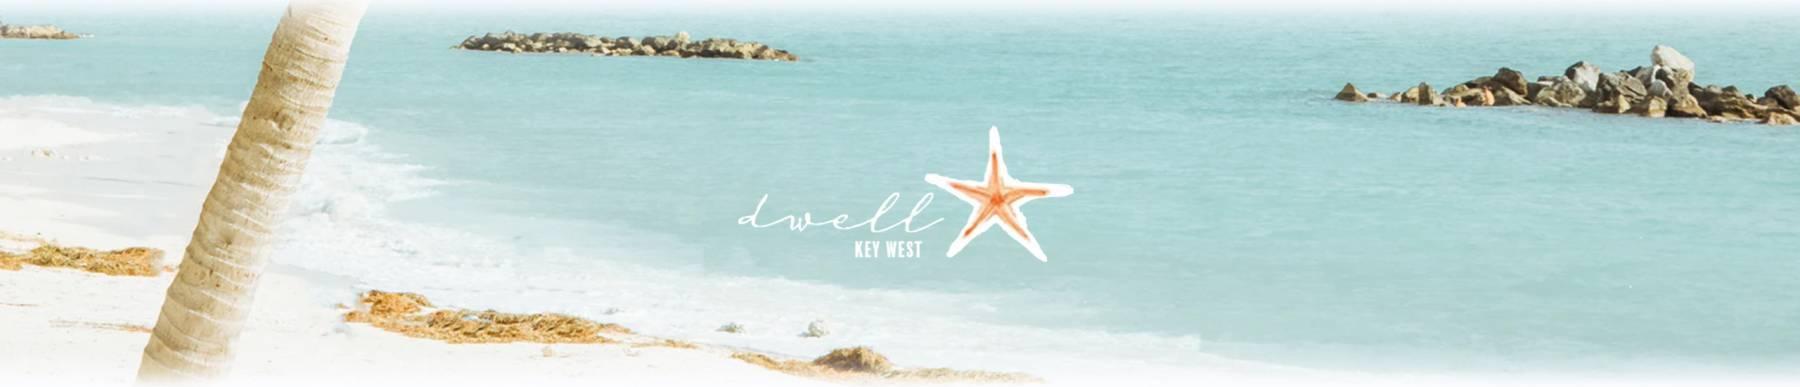 dwell key west banner